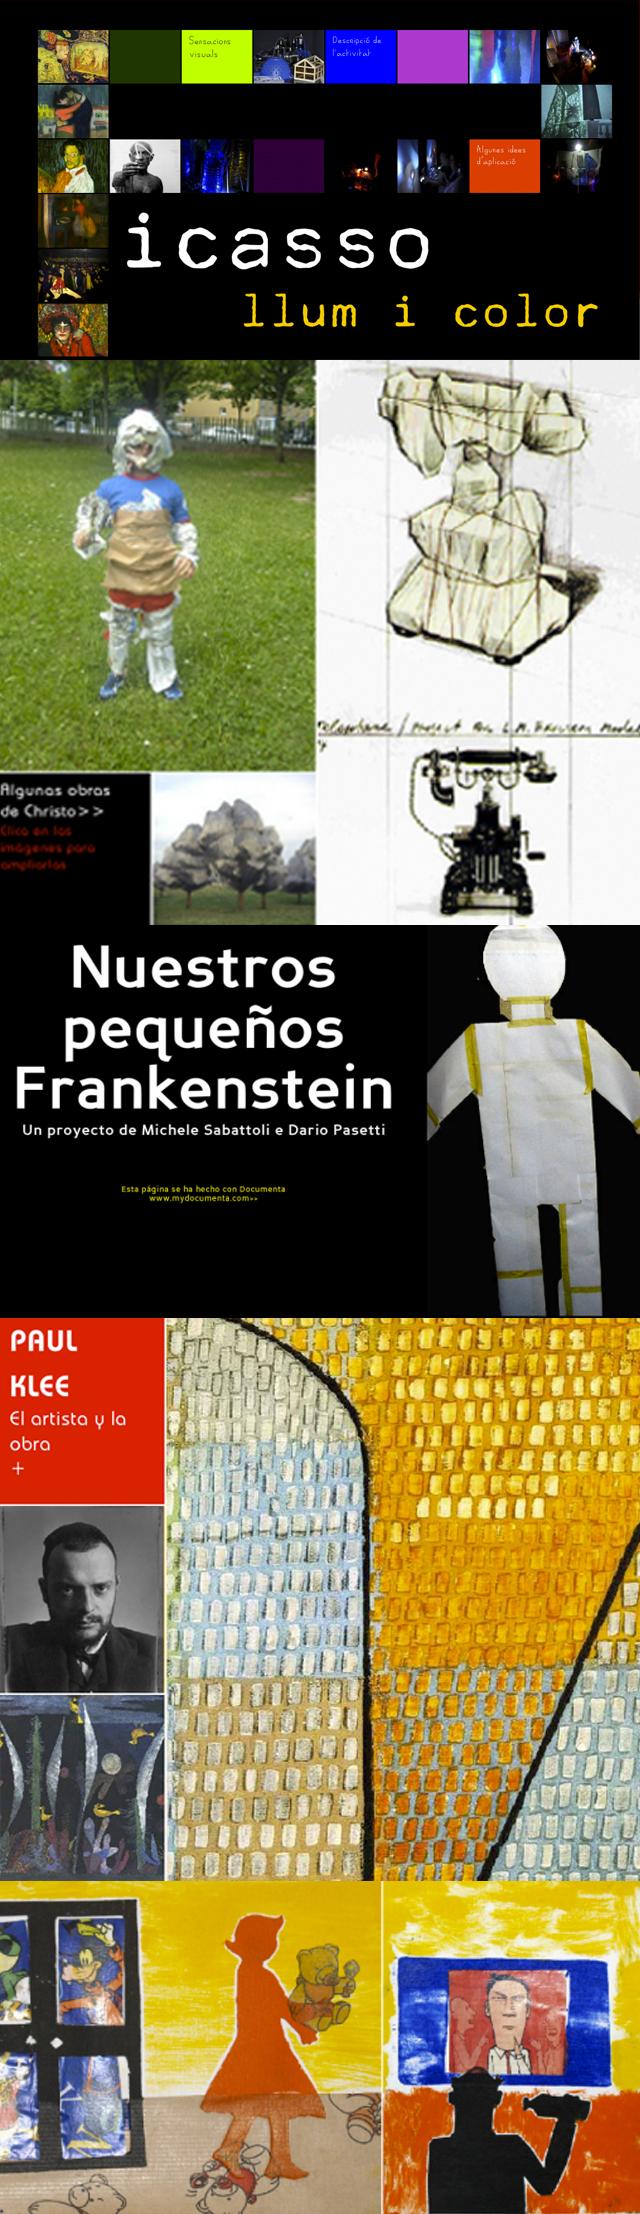 http://wwwhatsnew.com/wp-content/uploads/2012/02/ART-E_poster_MyDocumenta.jpg